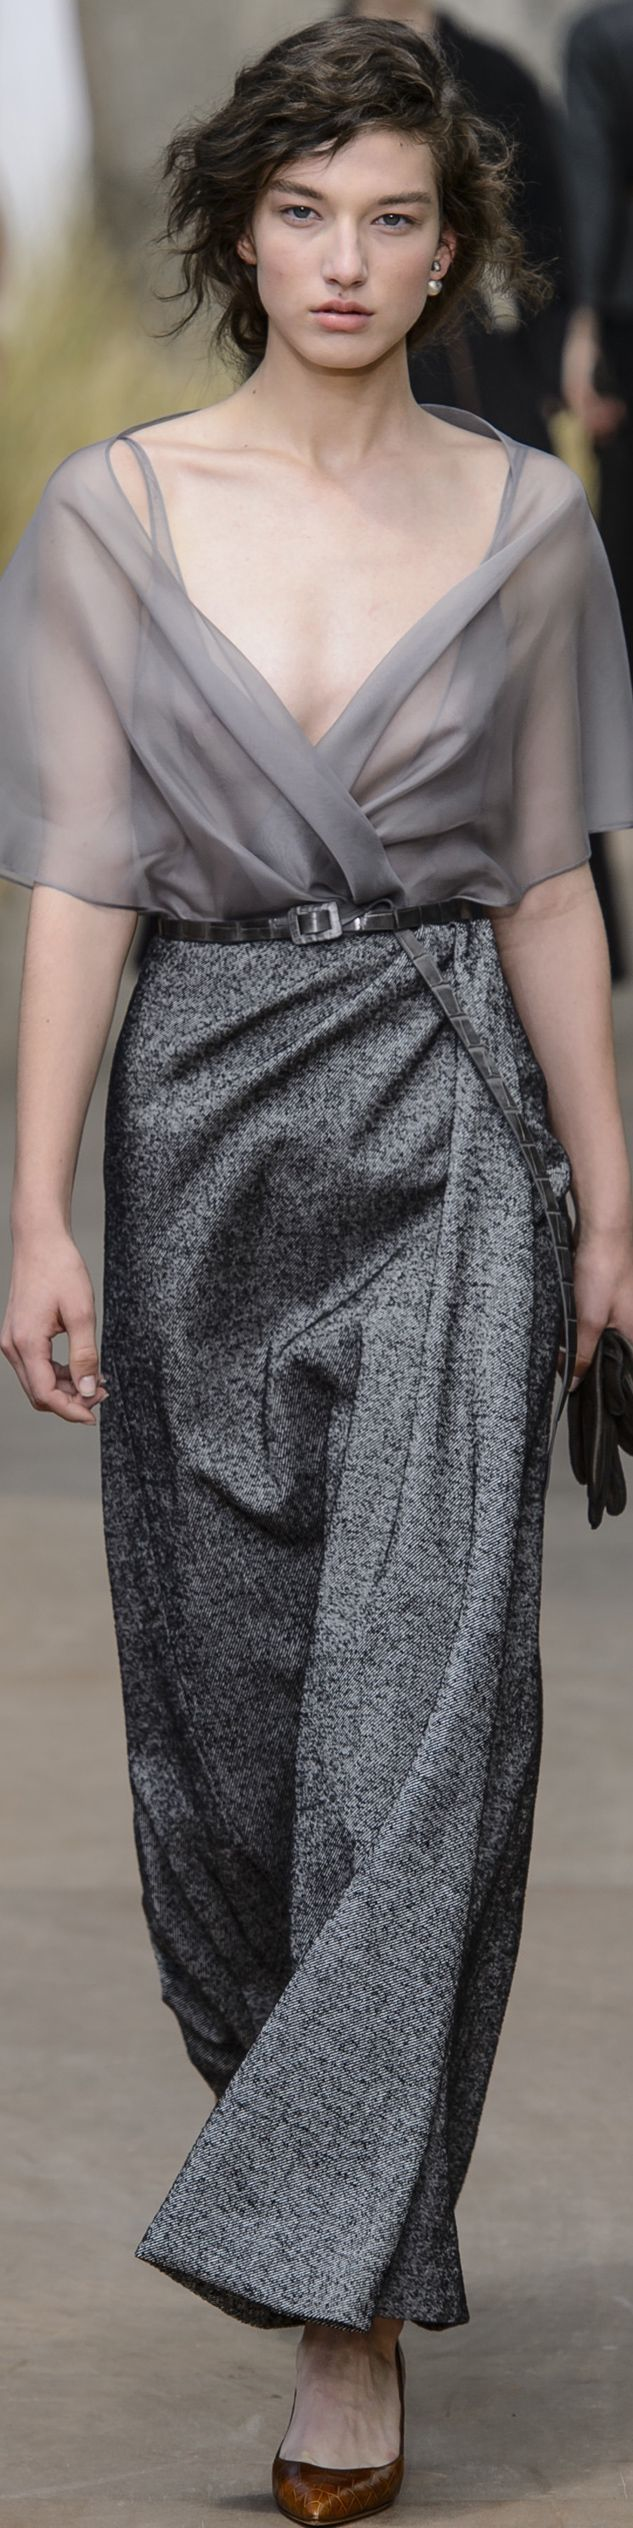 Dior Fall 2017 Haute Couture ✨ ʈɦҽ ƥᎧɲɖ ❤ﻸ•·˙❤•·˙ﻸ❤   ᘡℓvᘠ □☆□ ❉ღ // ✧彡☀️ ●⊱❊⊰✦❁❀ ‿ ❀ ·✳︎· ☘‿ TH JUL 13 2017‿☘✨ ✤ ॐ ♕ ♚ εїз⚜✧❦♥⭐♢❃ ♦♡ ❊☘нανє α ηι¢є ∂αу ☘❊ ღ 彡✦ ❁ ༺✿༻✨ ♥ ♫ ~*~ ♆❤ ☾♪♕✫ ❁ ✦●↠ ஜℓvஜ .❤ﻸ•·˙❤•·˙ﻸ❤